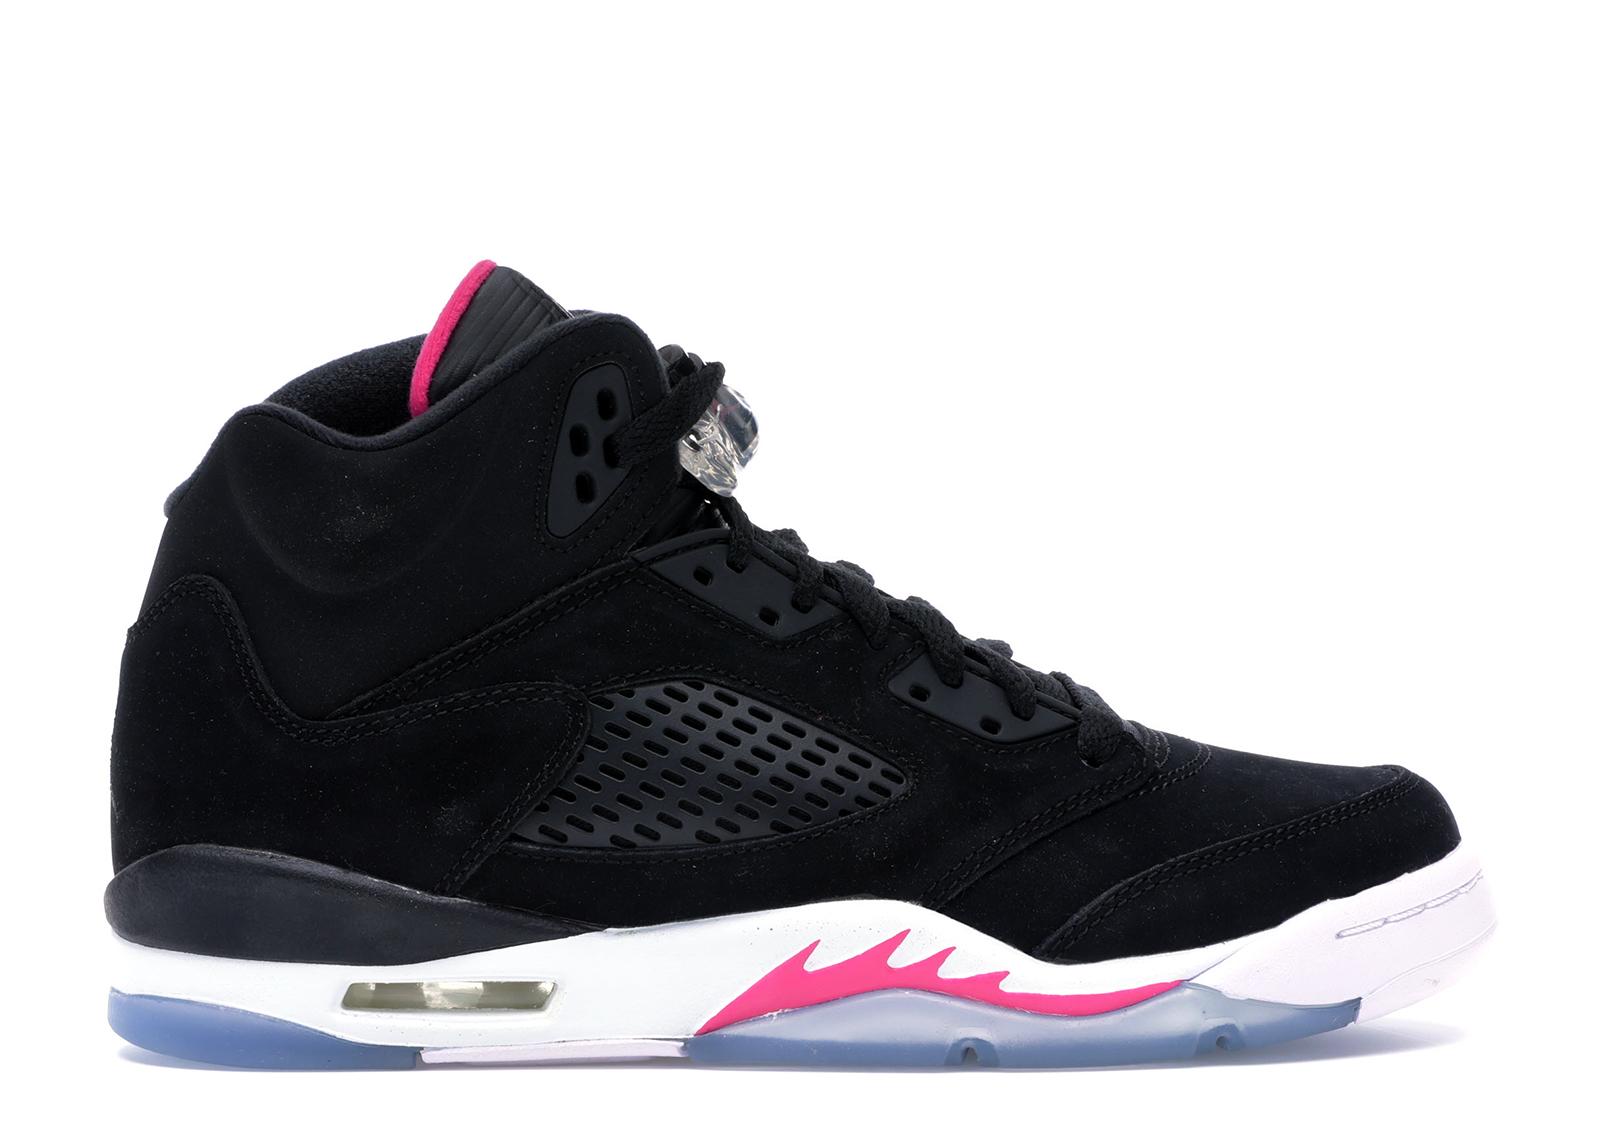 Jordan 5 Retro Black Deadly Pink (GS)